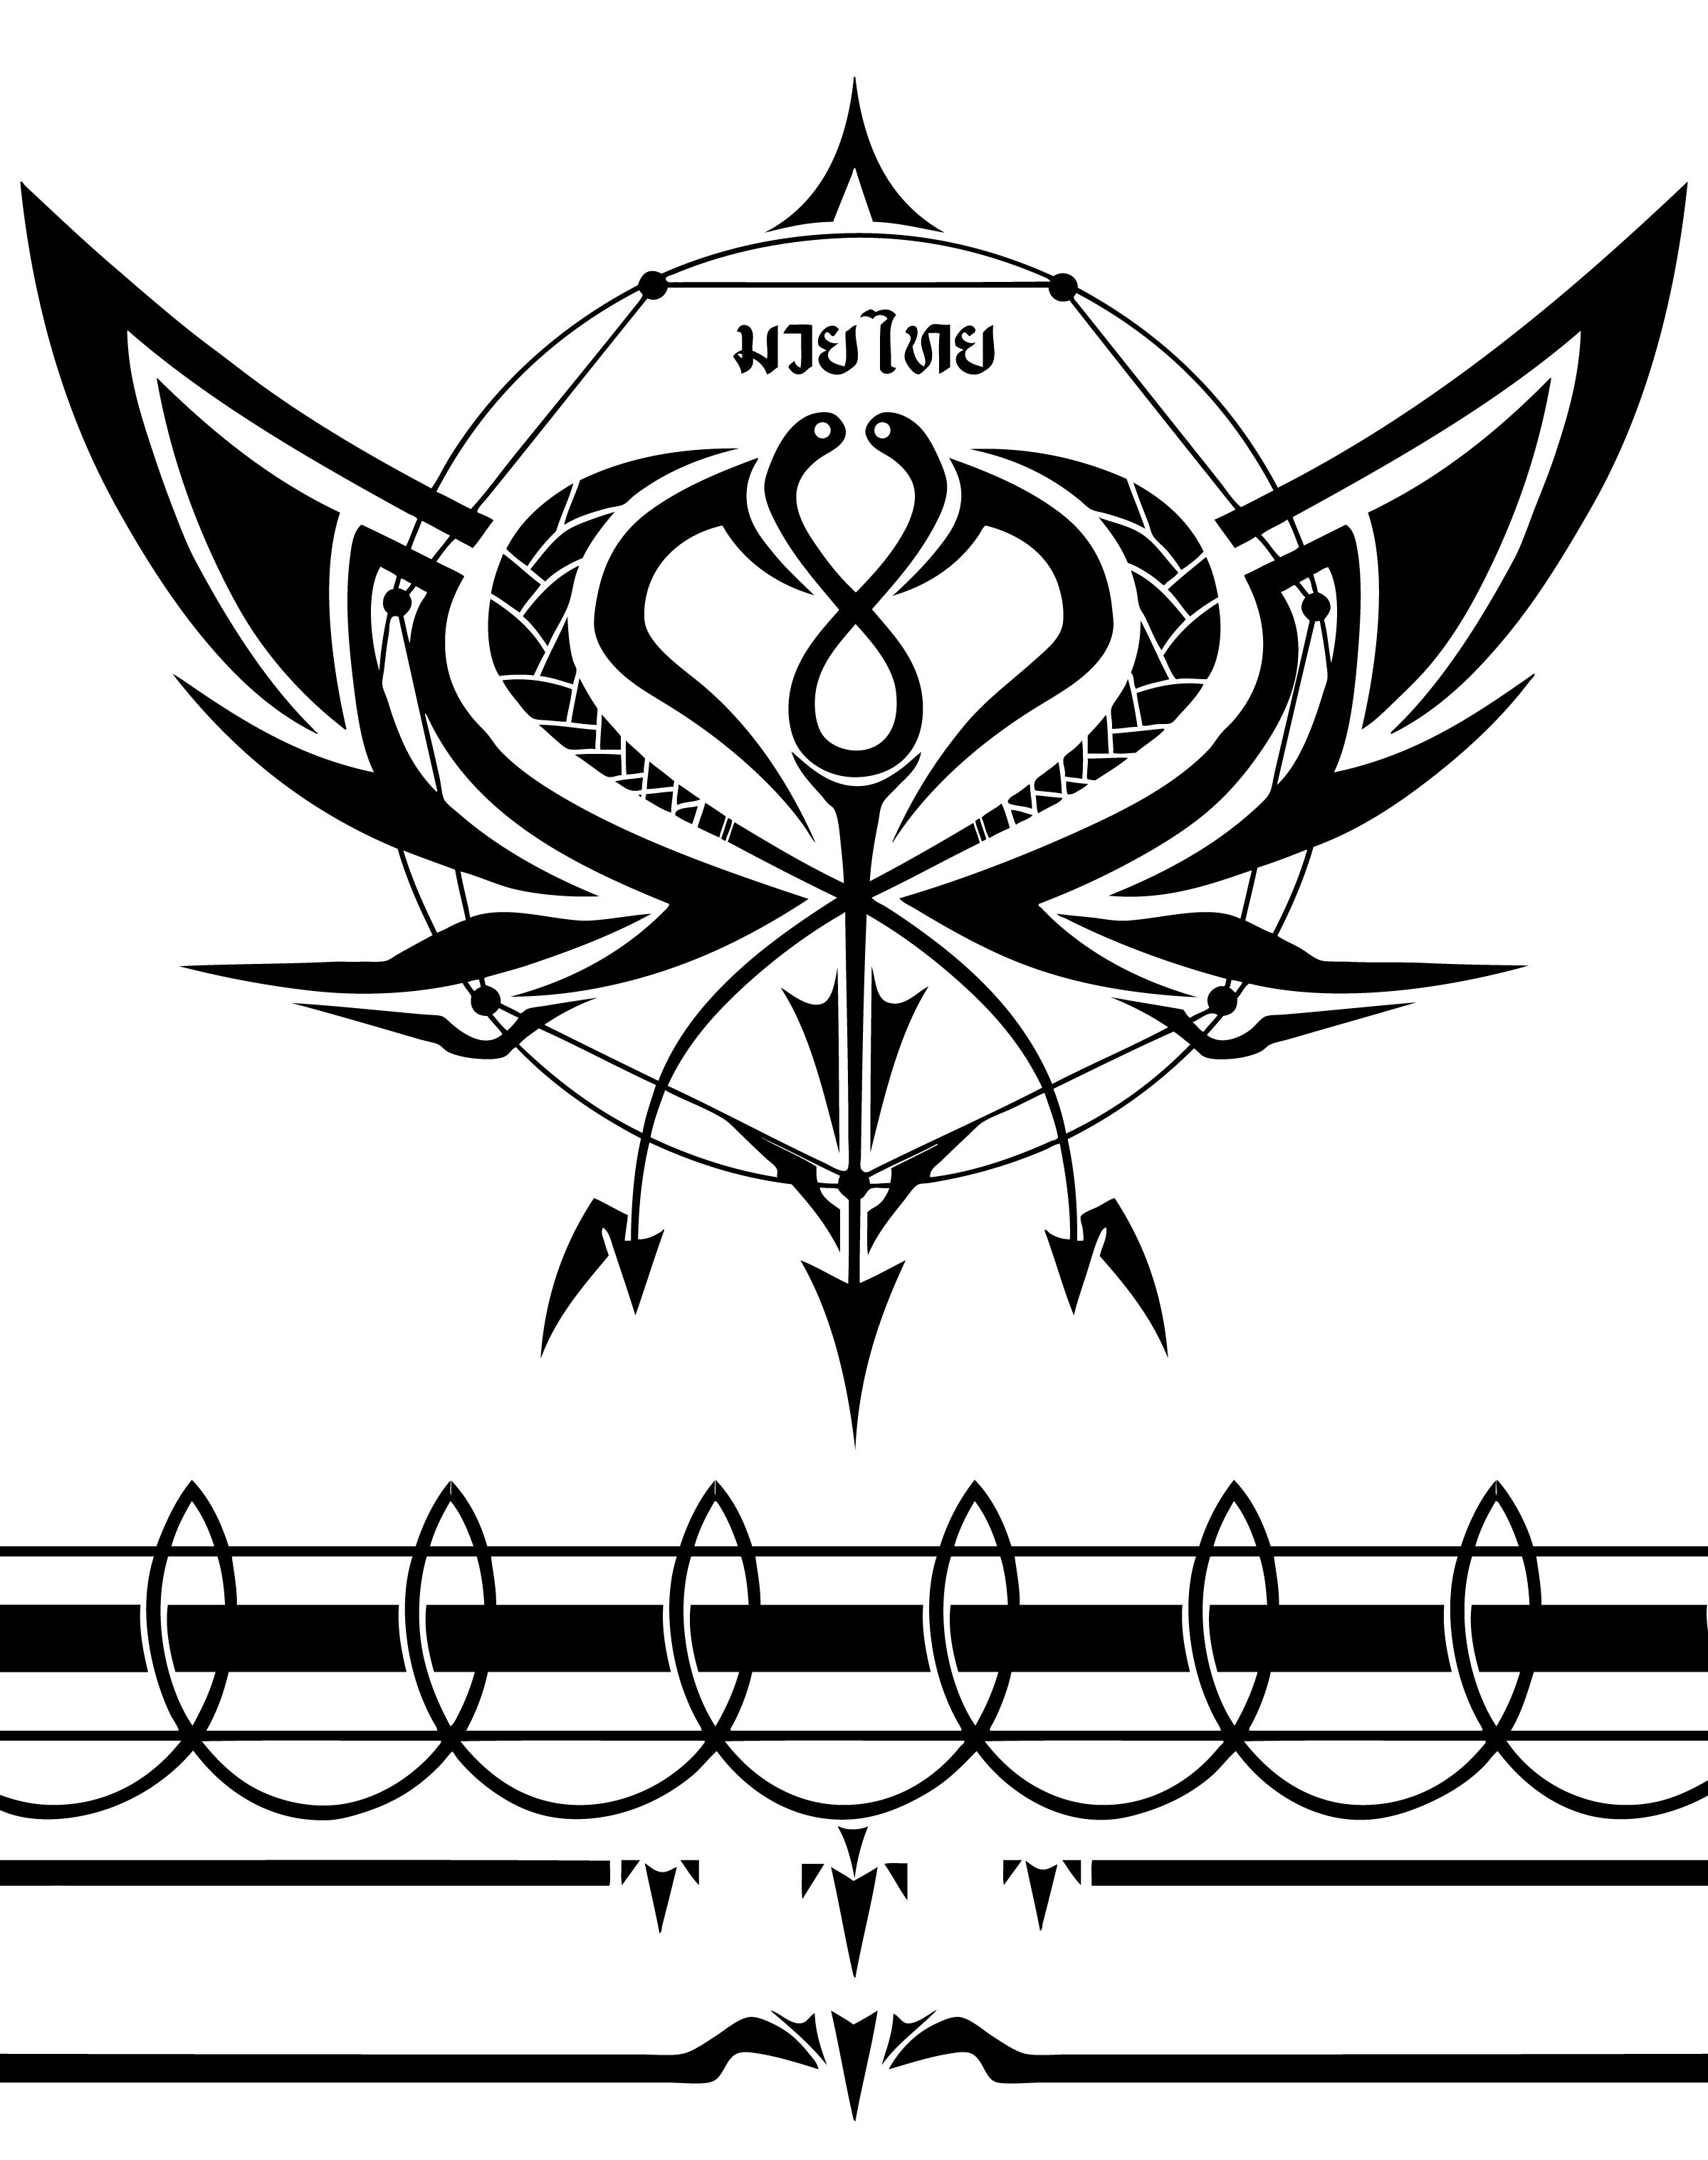 scar array tattoo design by thereallehel on deviantart. Black Bedroom Furniture Sets. Home Design Ideas